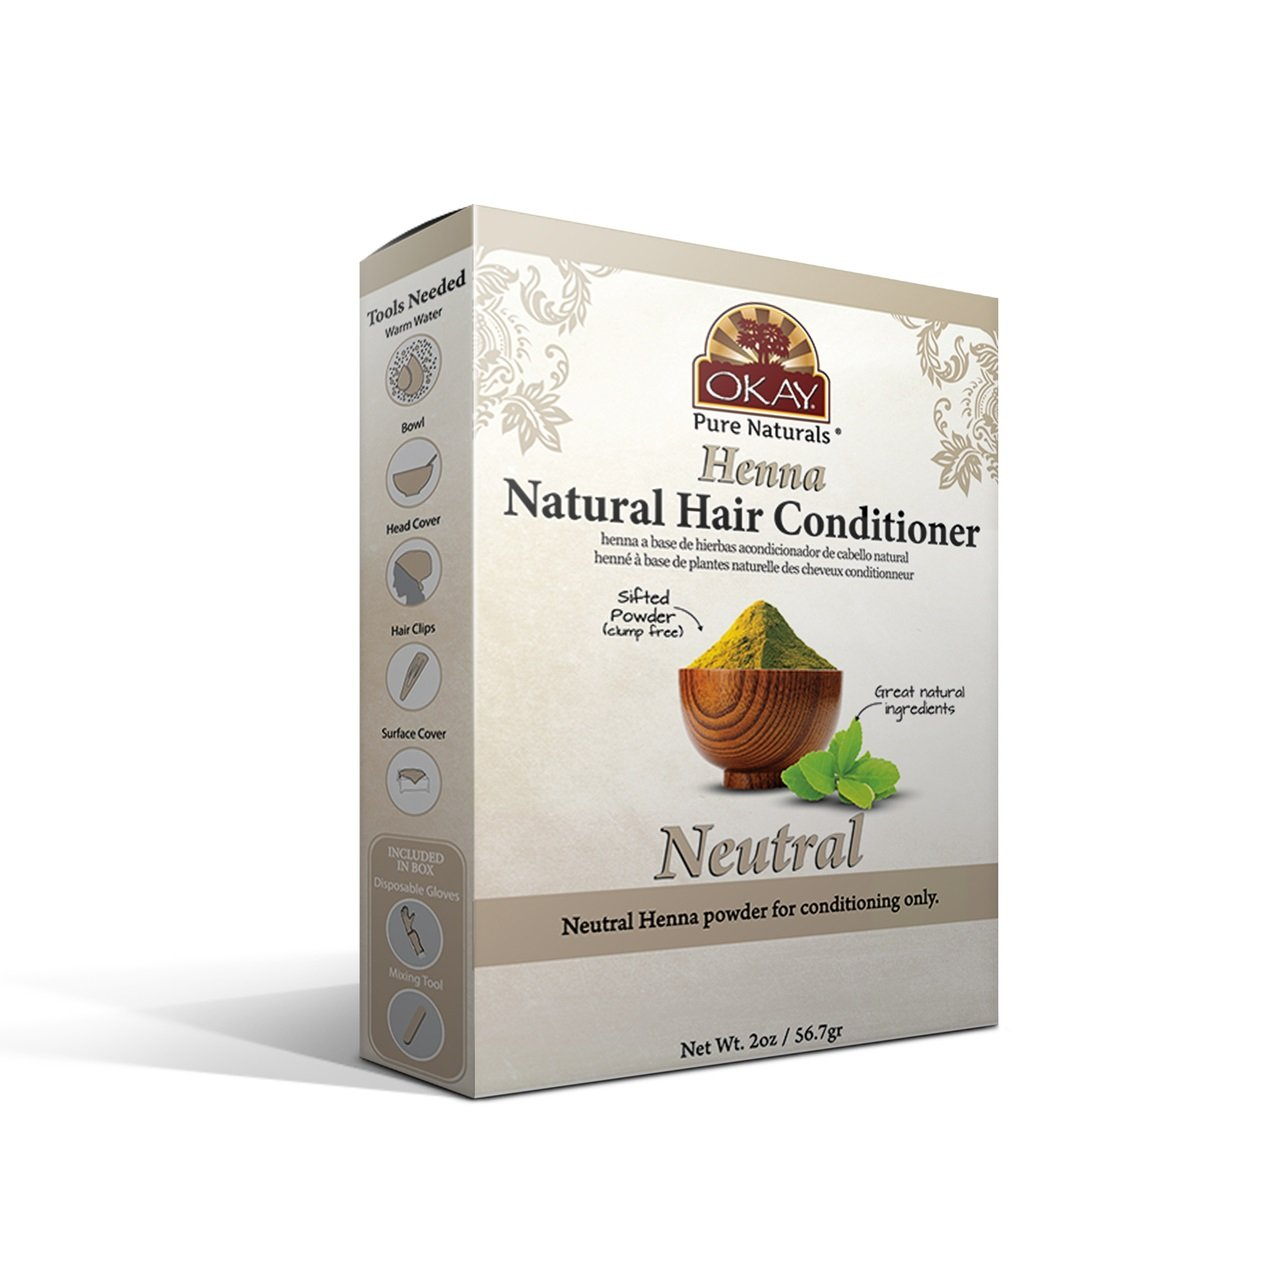 OKAY Herbal henna color neutral henna 50gr Xtreme Beauty International OKAY-HHNEUT2